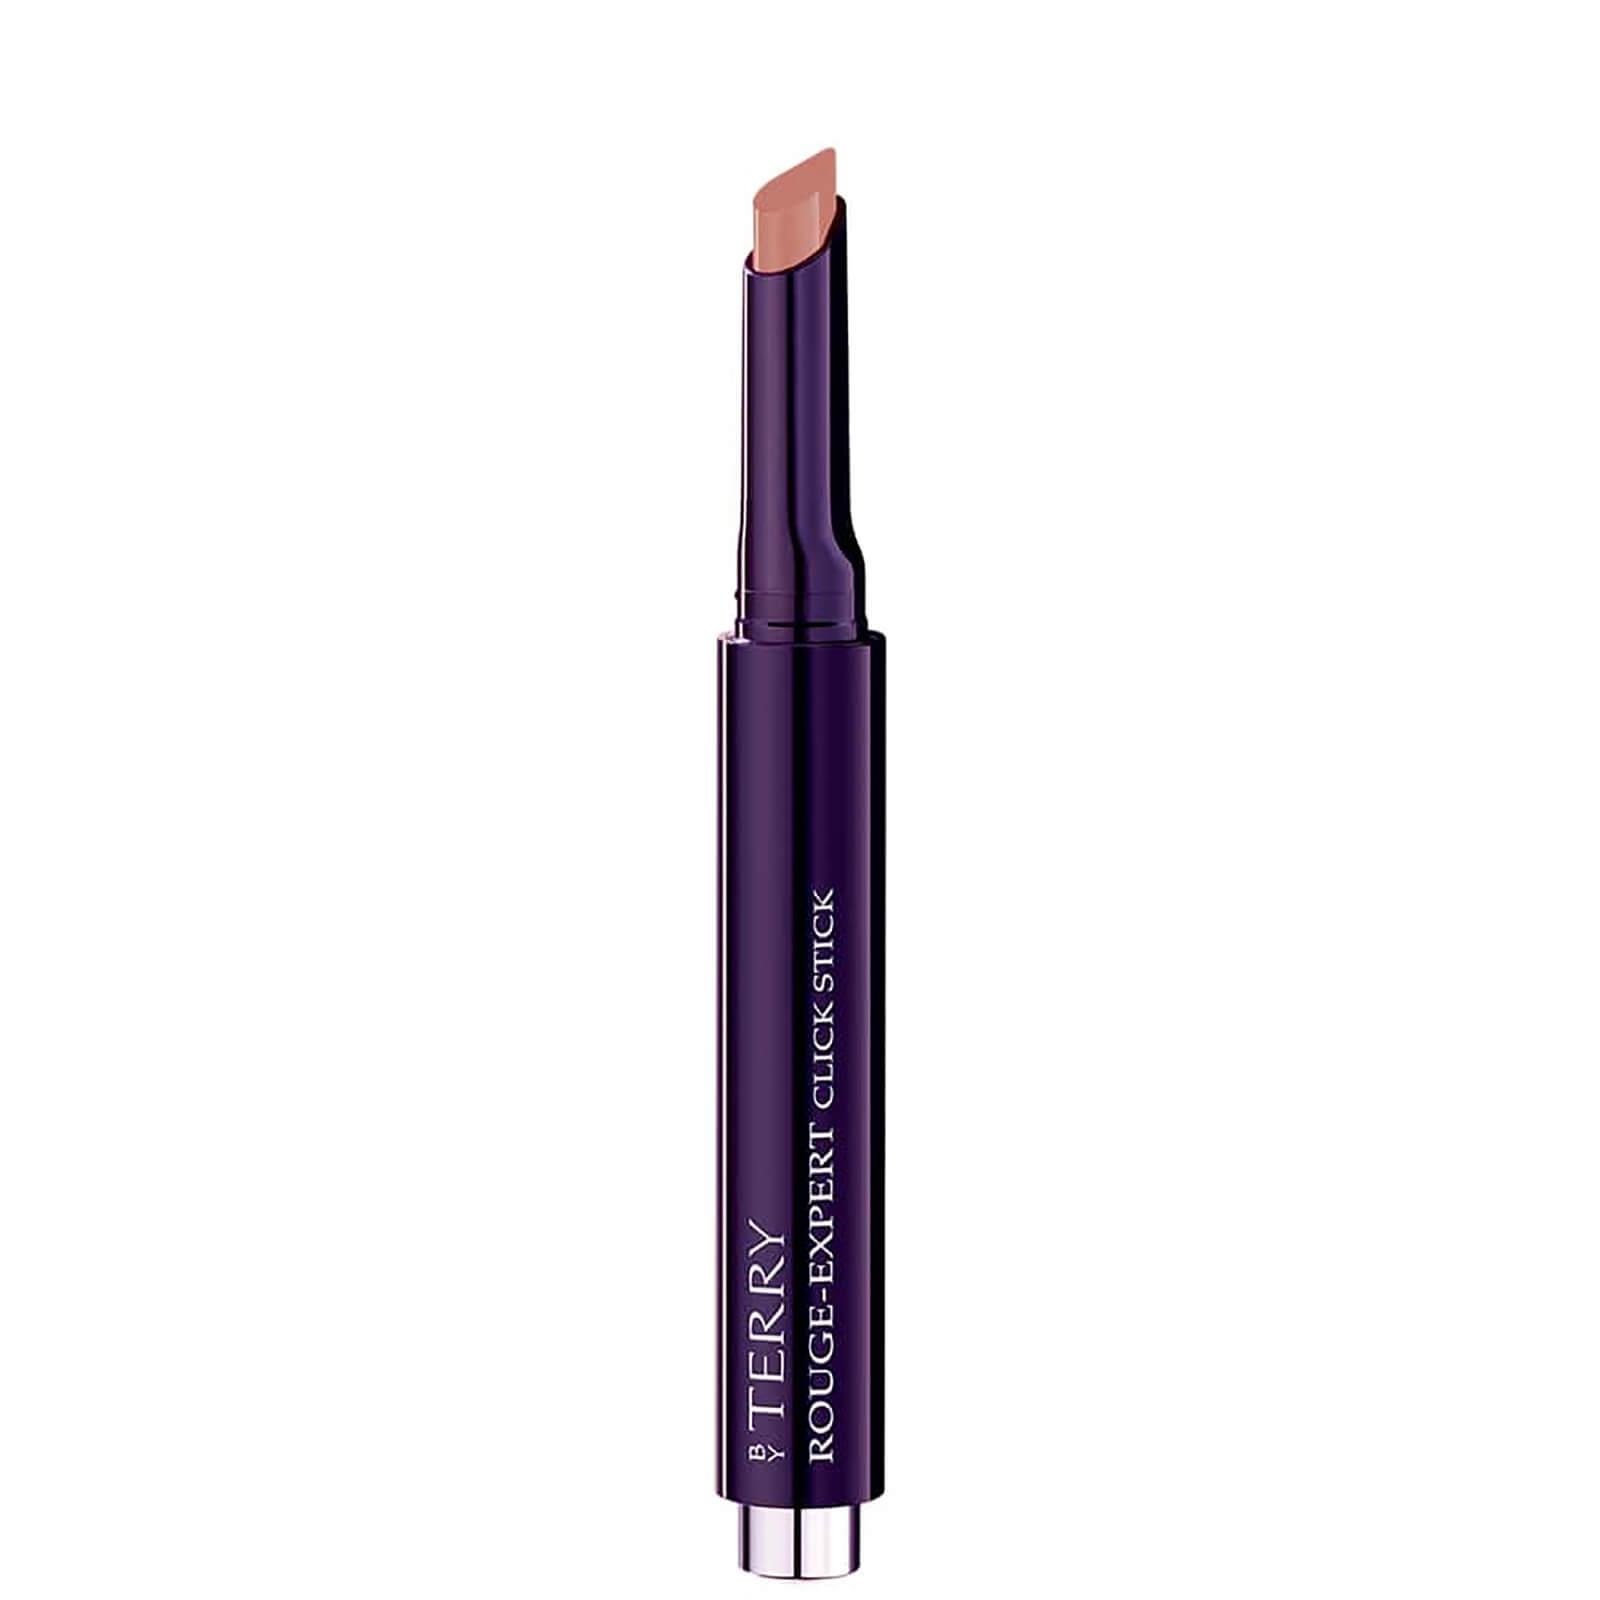 Купить Губная помада By Terry Rouge-Expert Click Stick Lipstick 1, 5 г (различные оттенки) - Mimetic Beige